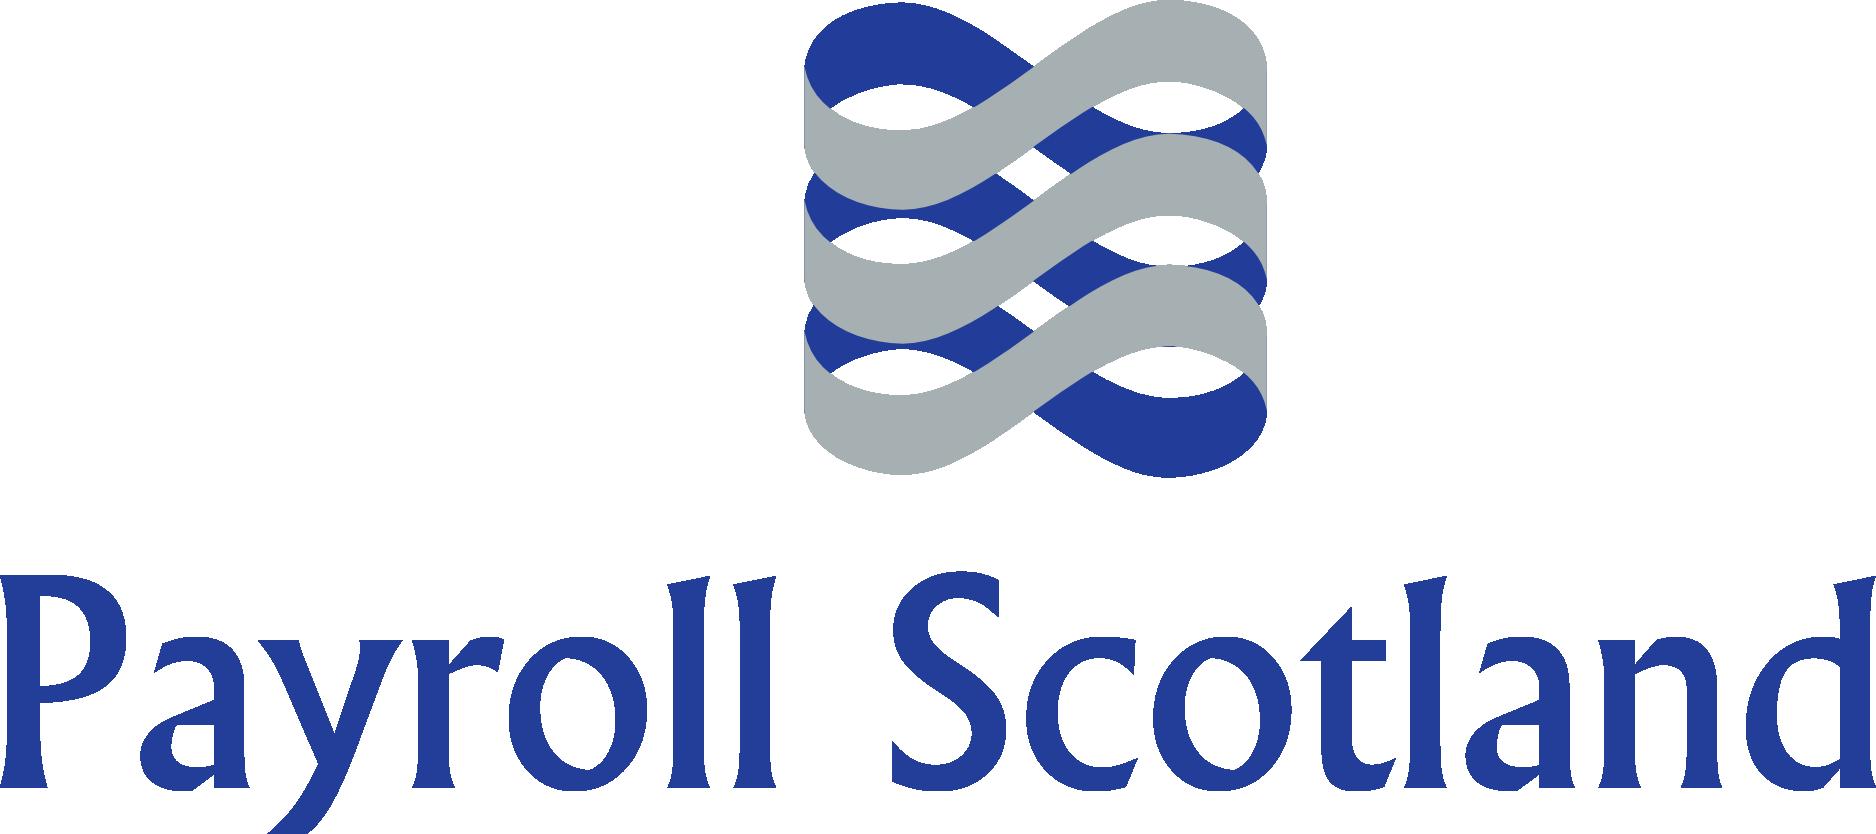 Payroll Scotland